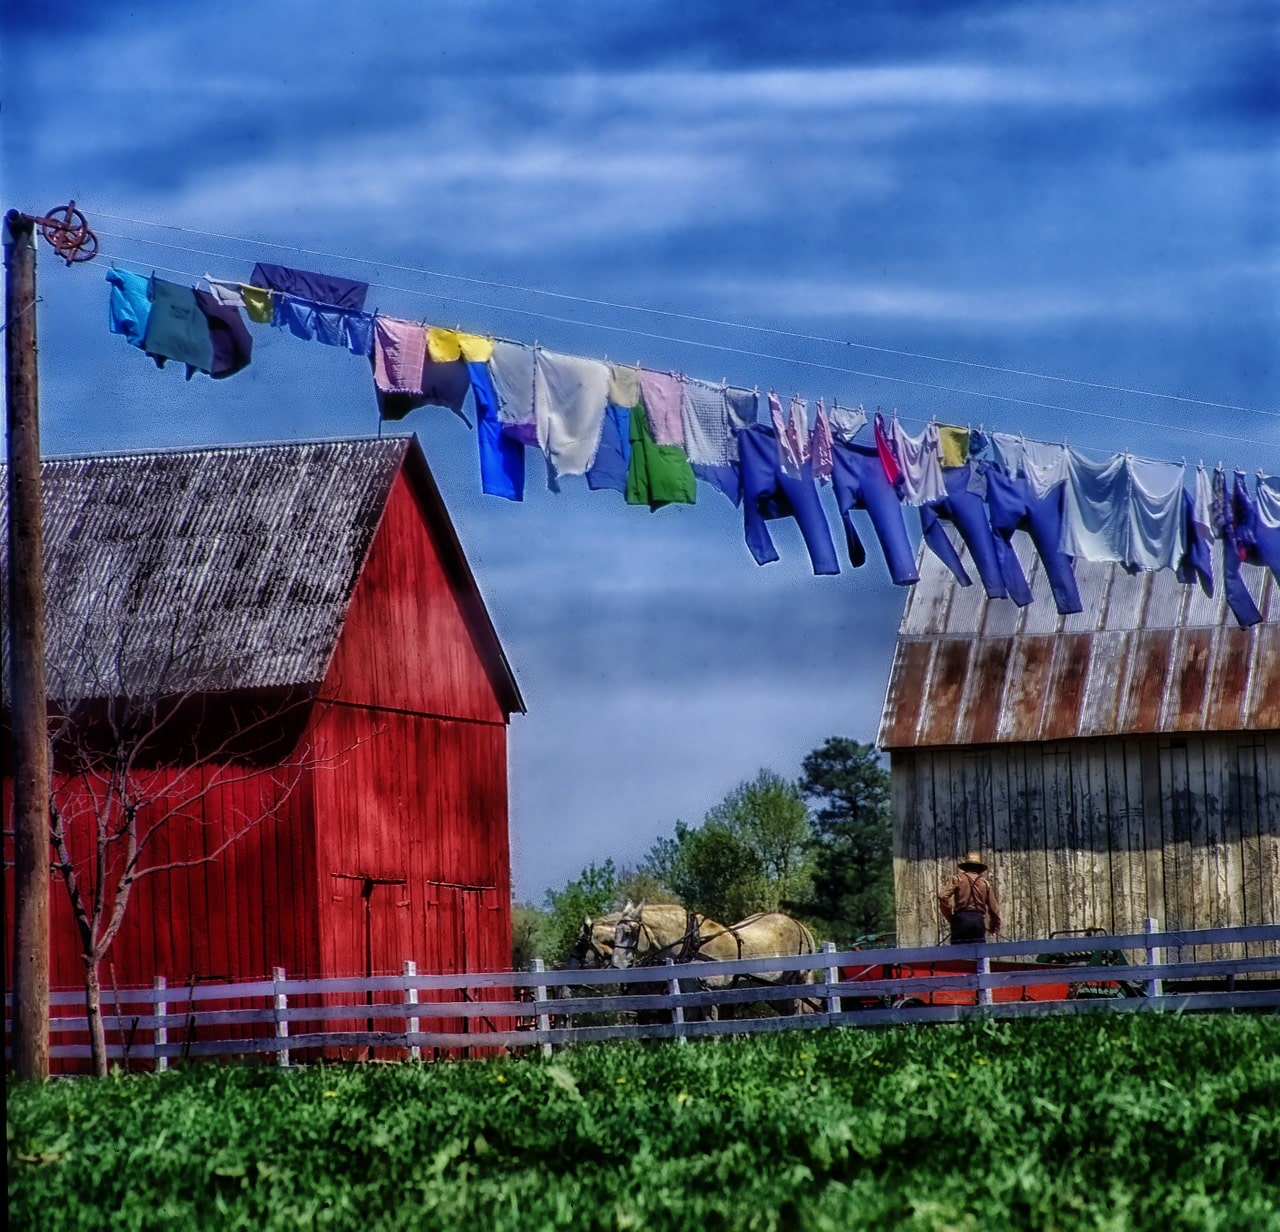 Cheekys, Rural Clothing Manufacturer